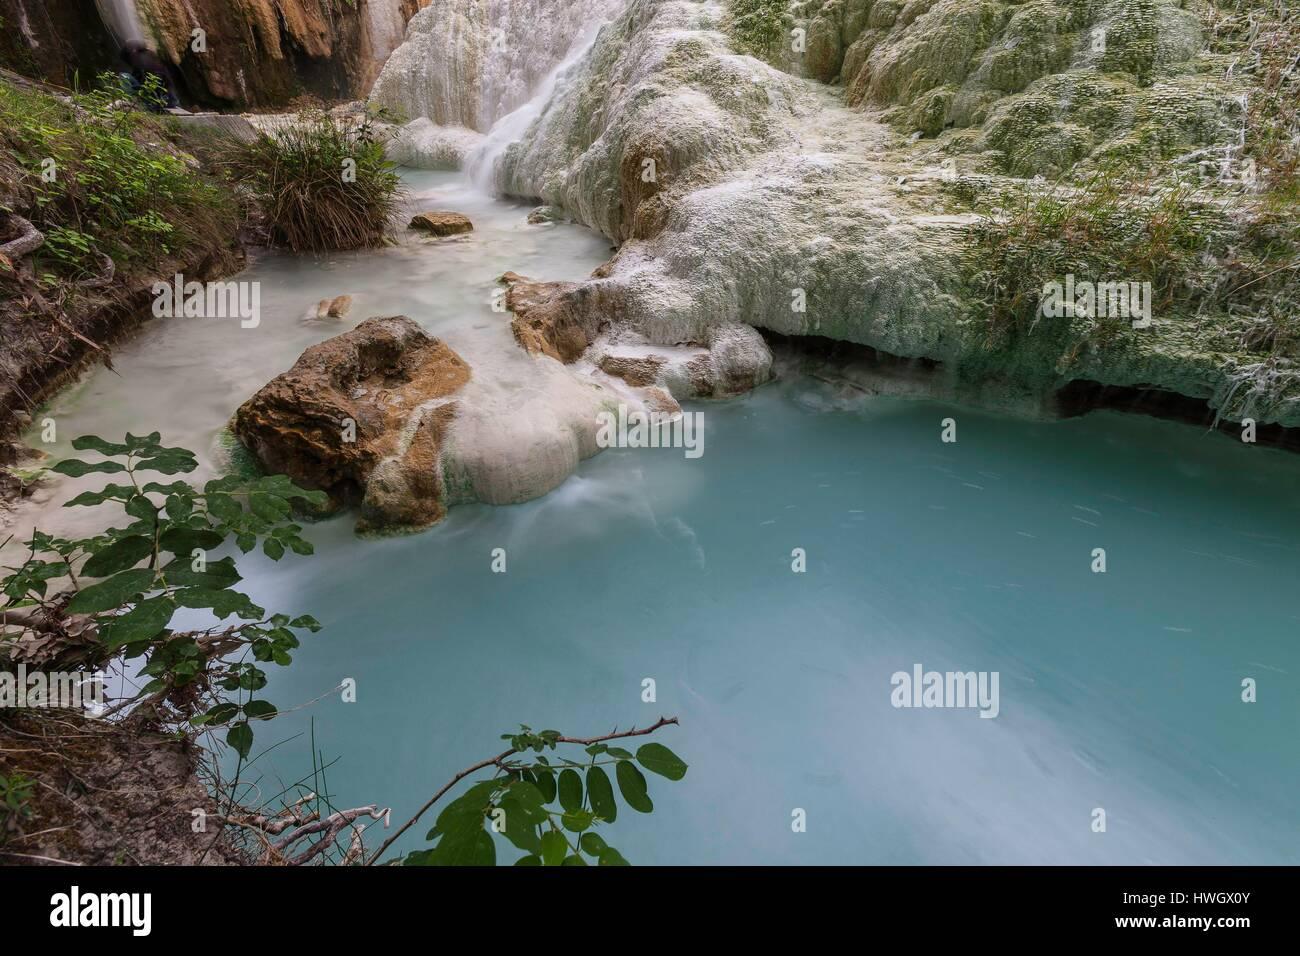 Bagni San Filippo Stock Photos & Bagni San Filippo Stock Images - Alamy